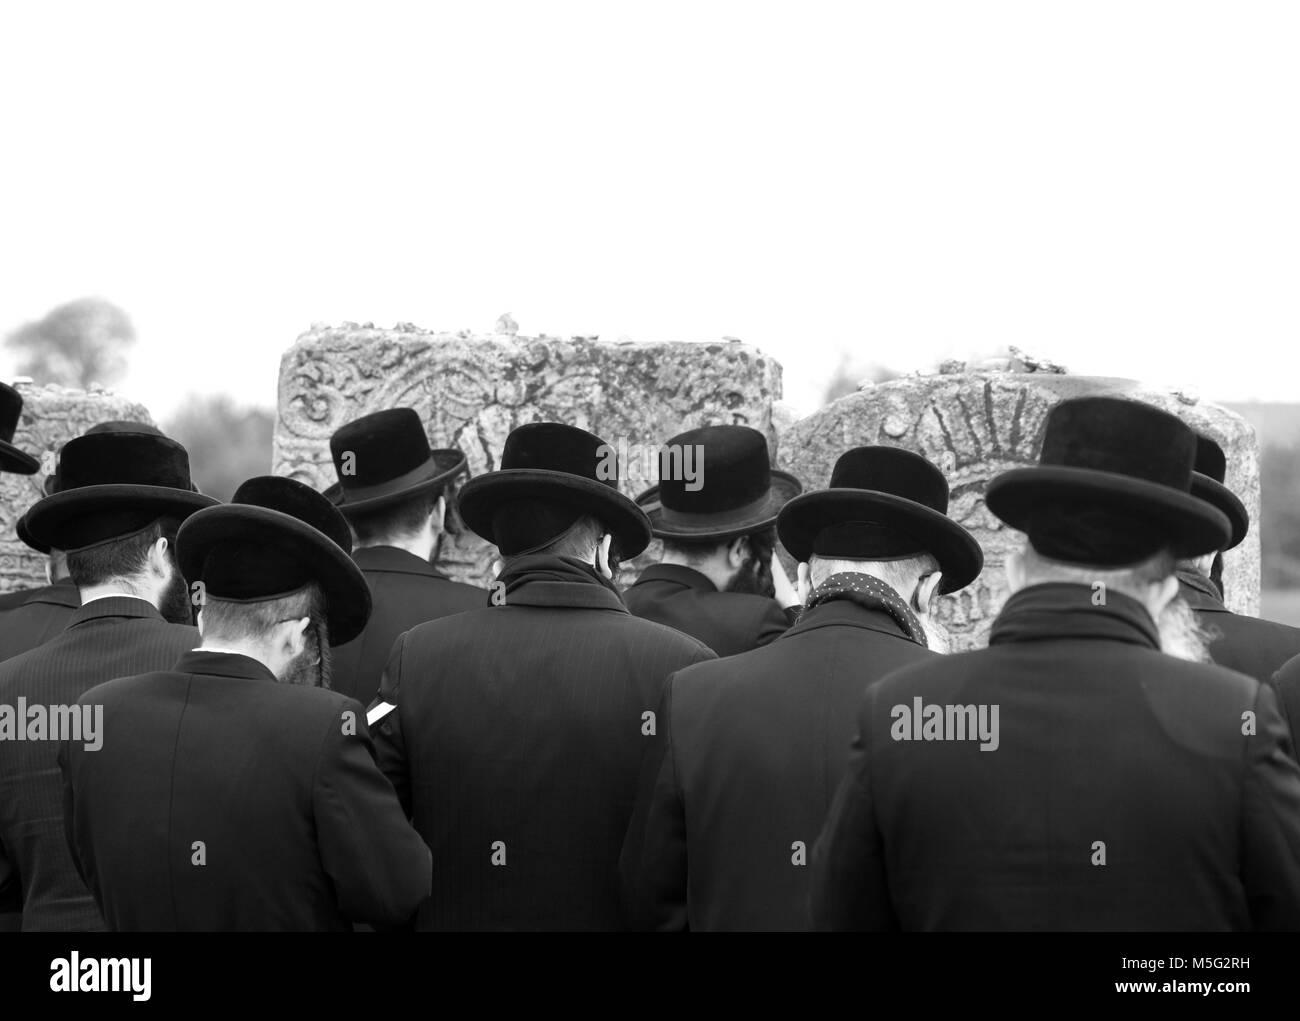 jews, jewish, judaism, hasidim, back, behind - Stock Image